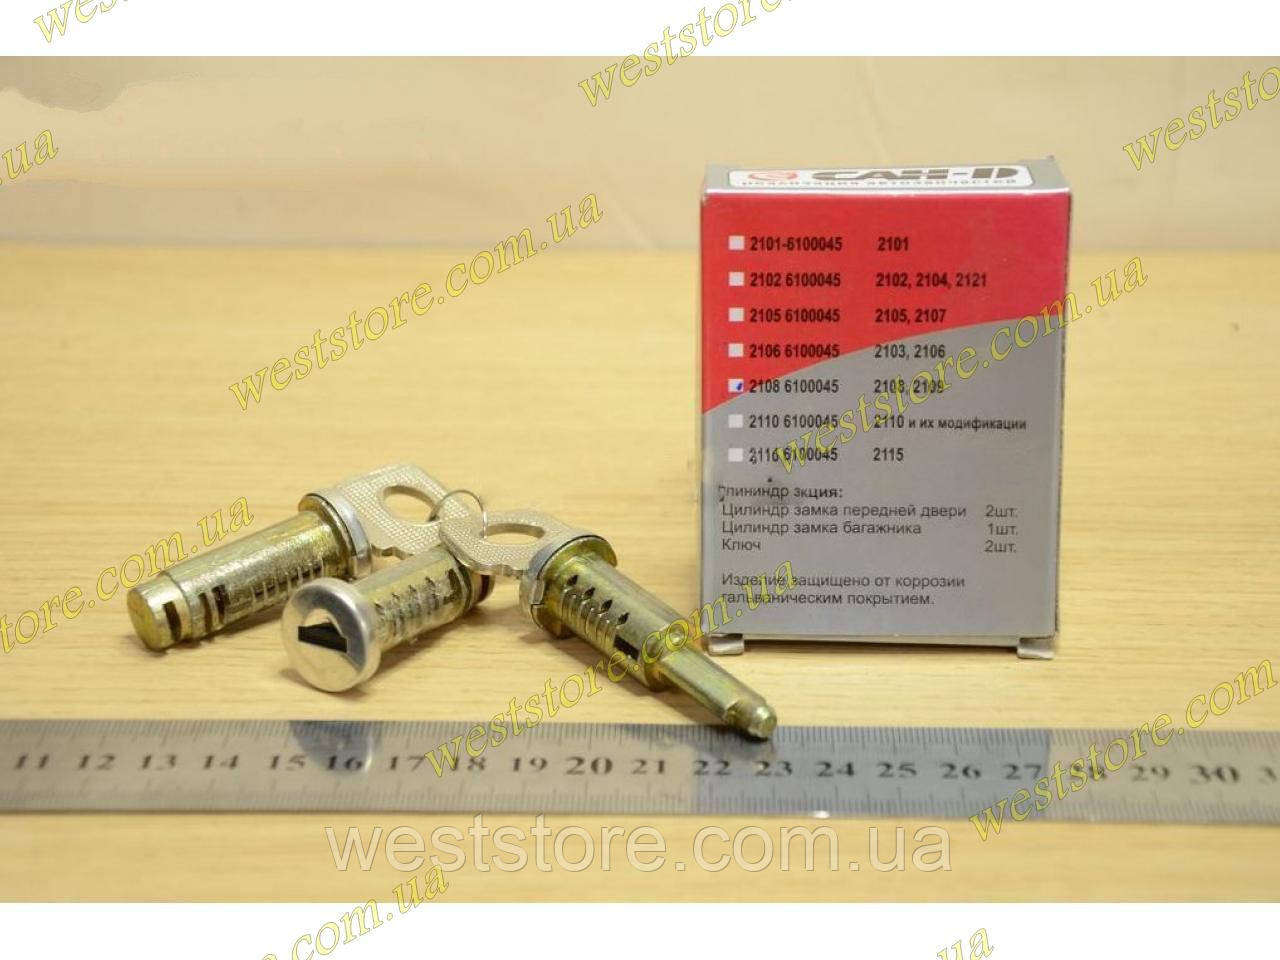 Личинки (цилиндры) замков дверей Ваз 2108 2109 21099